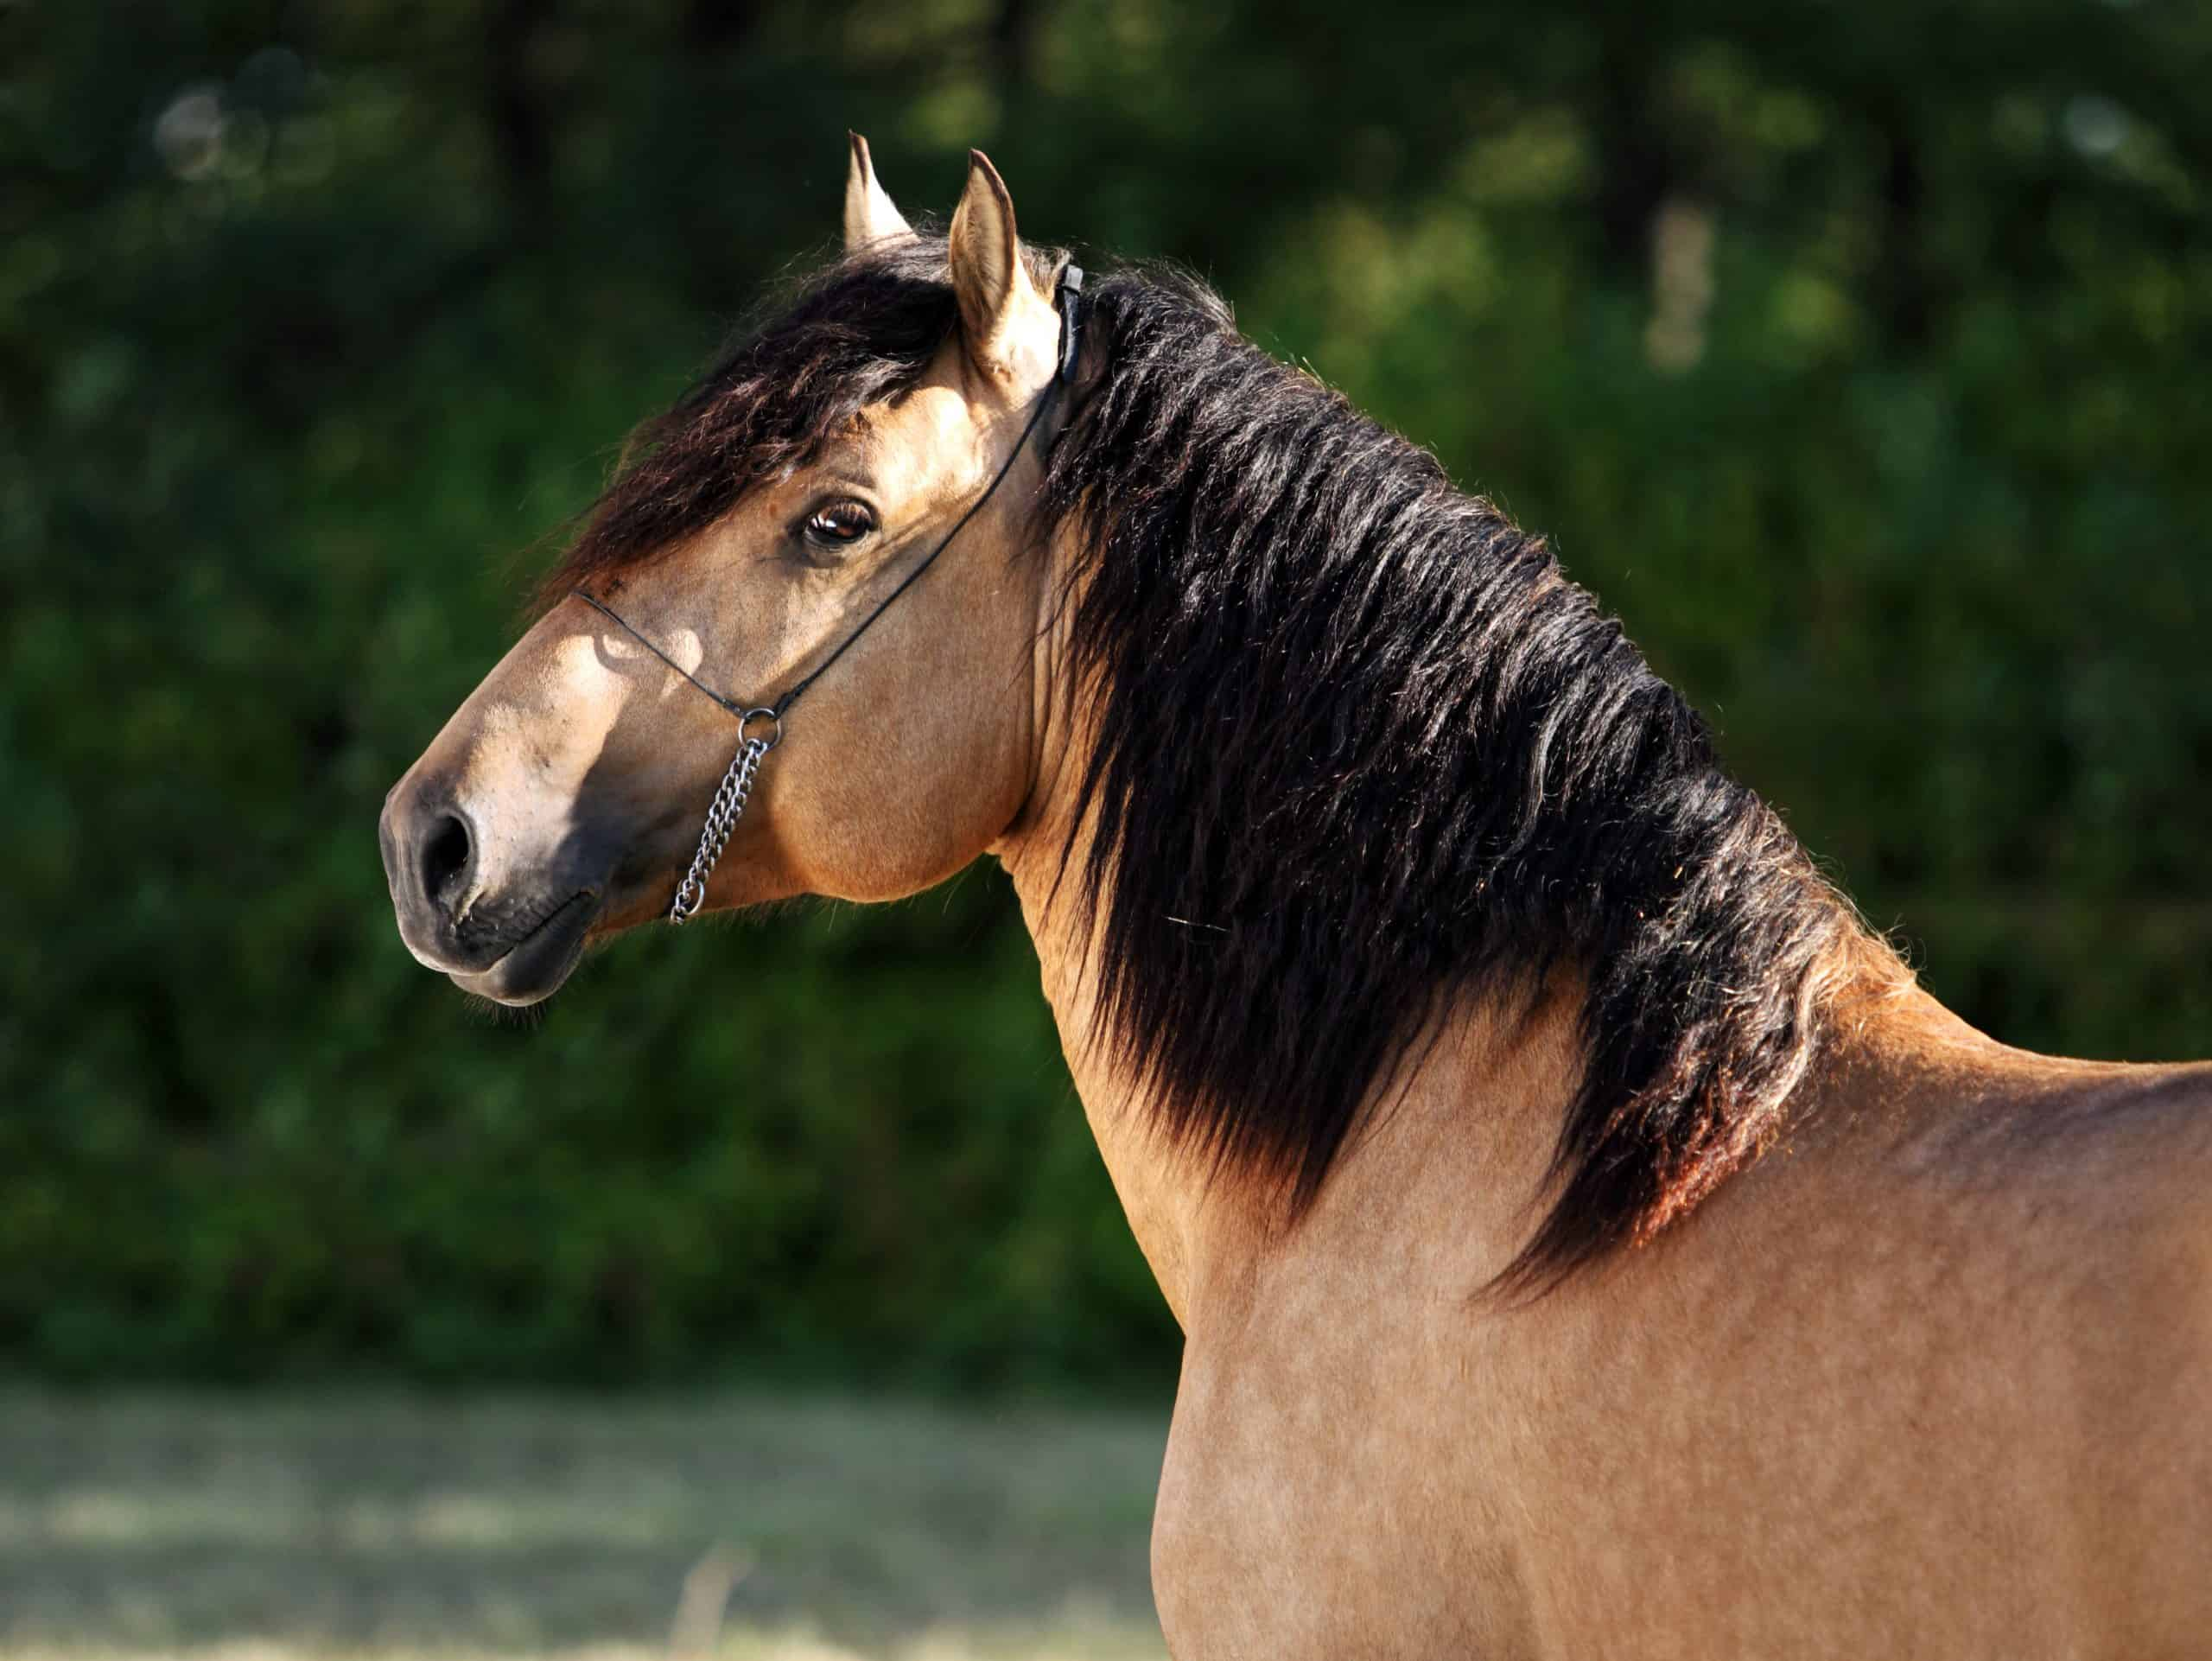 Gypsy Vanner Horse stallion portrait in evening stud farm